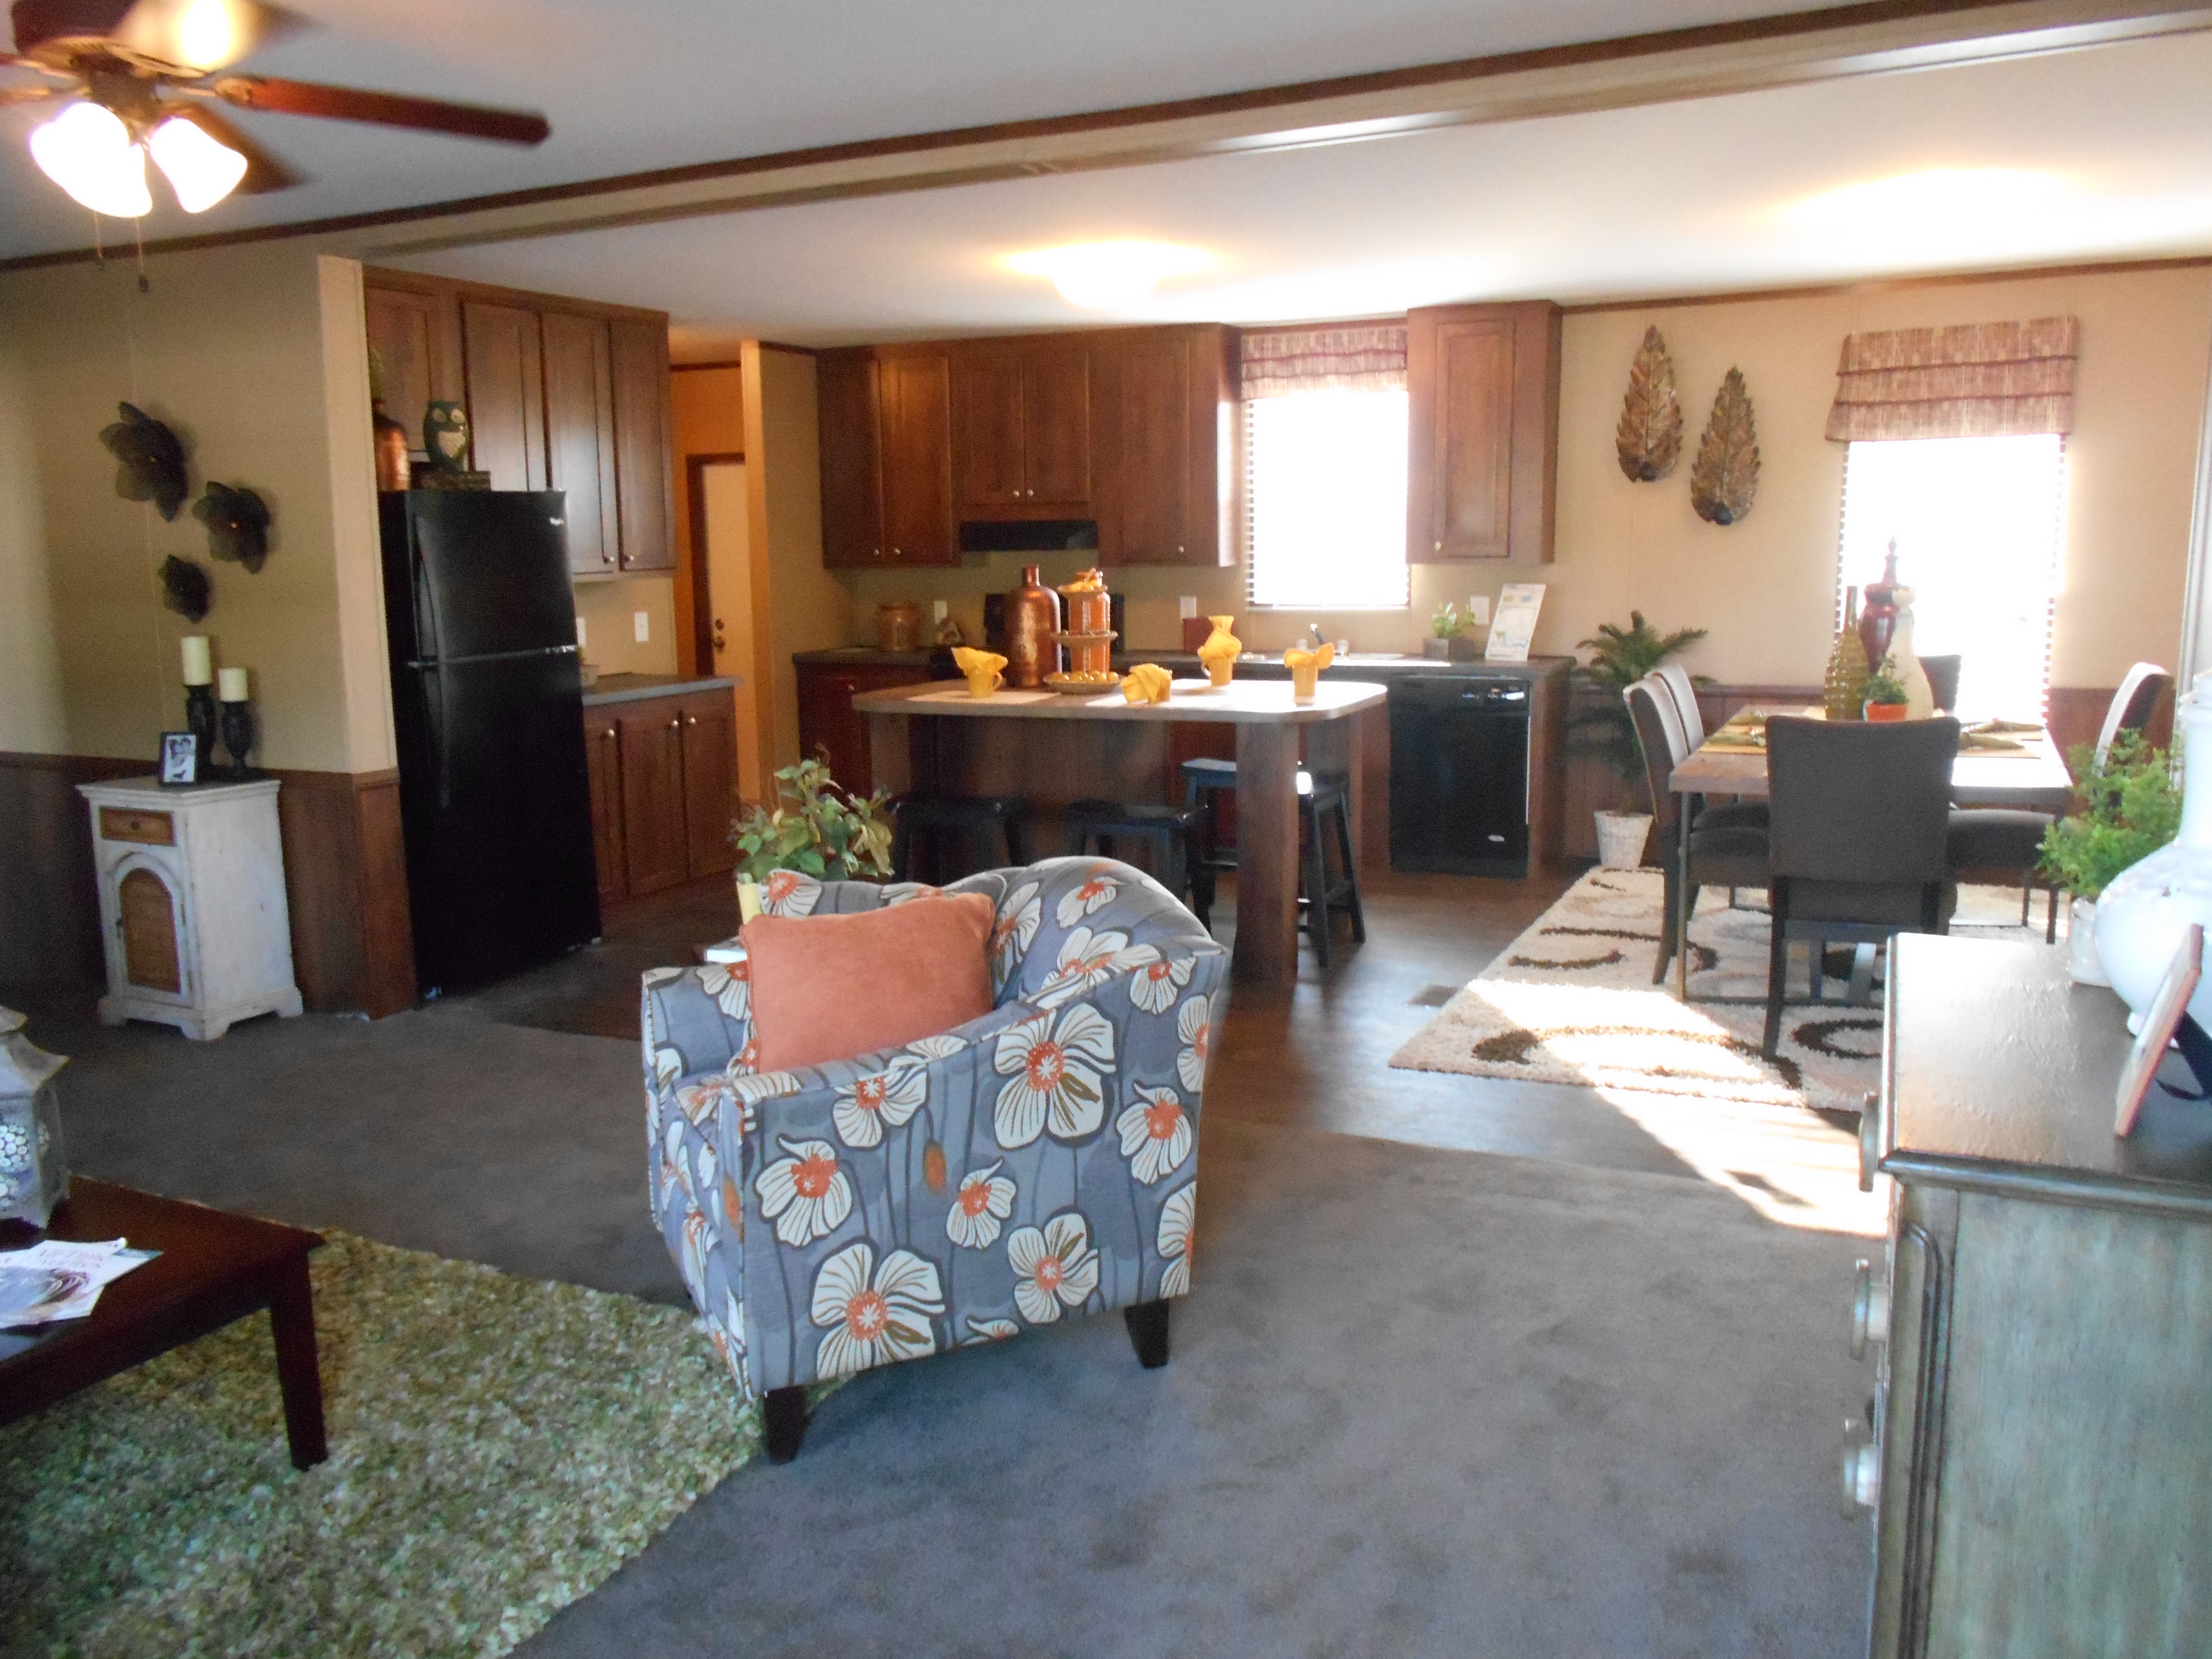 Clayton Homes in Jackson, TN 38301 - ChamberofCommerce.com on clayton wi, clayton ny, clayton de, clayton la, clayton wa,